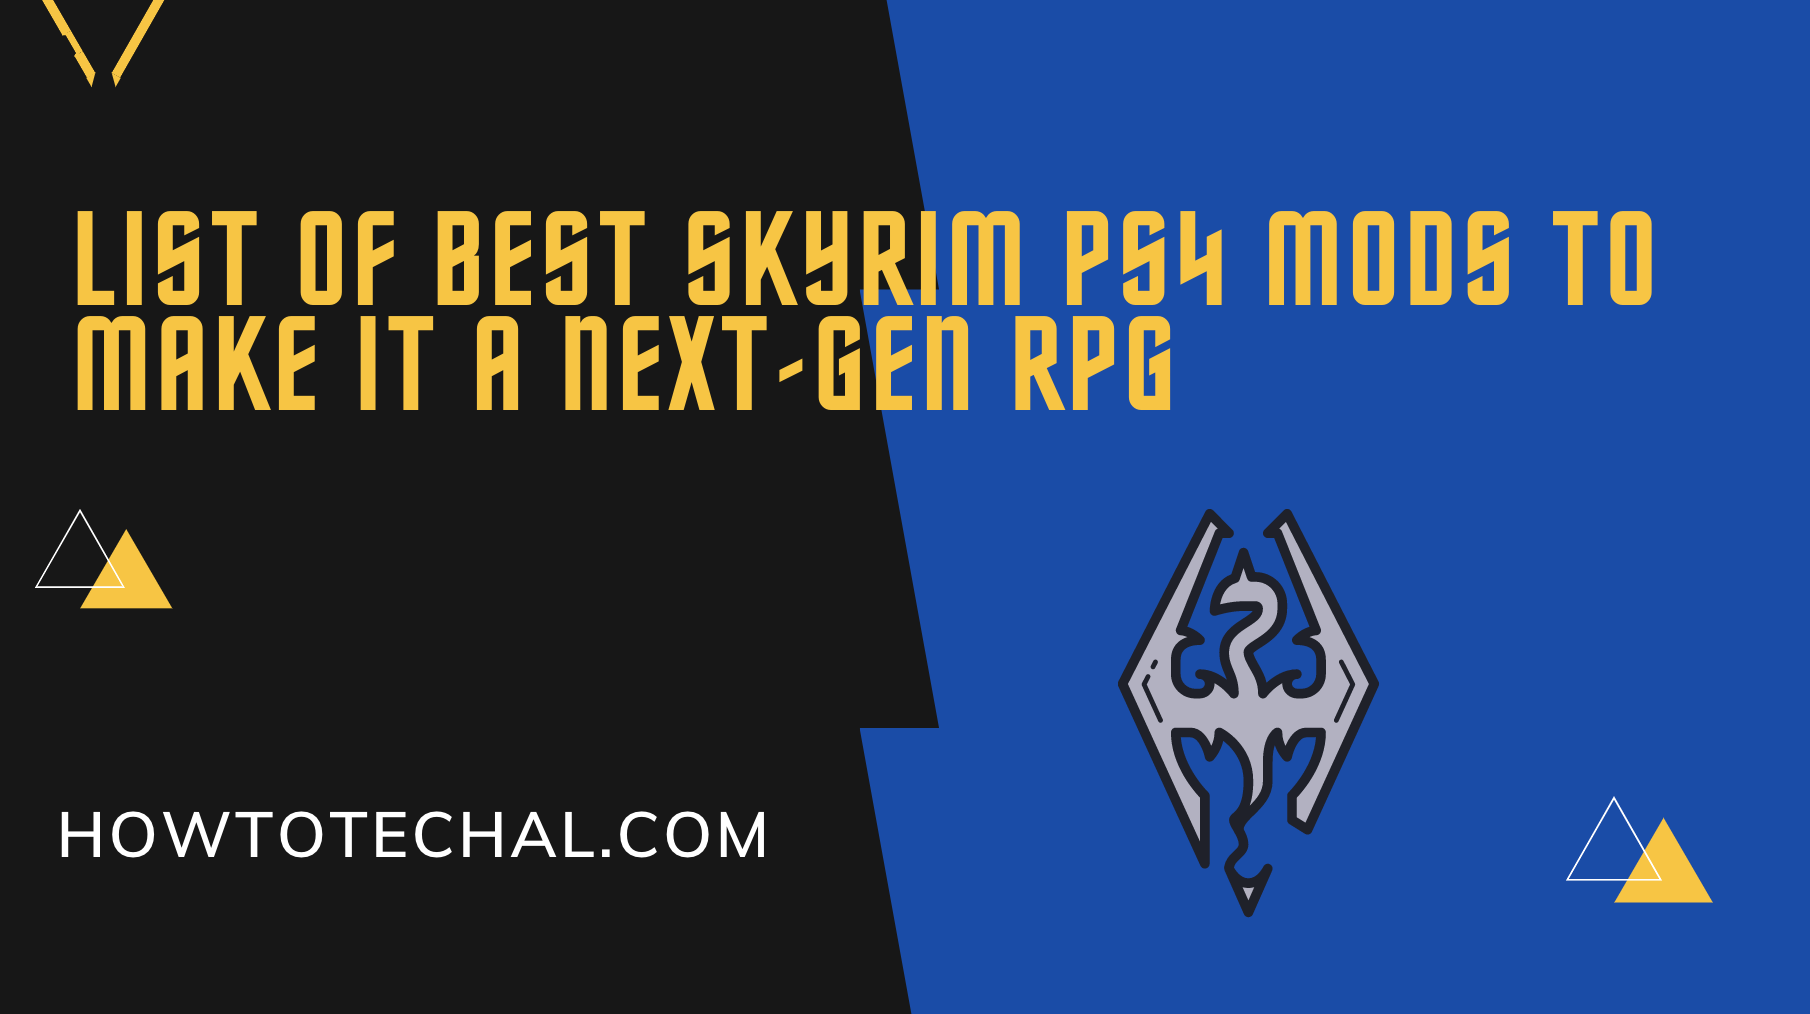 List of Best Skyrim Ps4 Mods To Make It A Next-Gen RPG